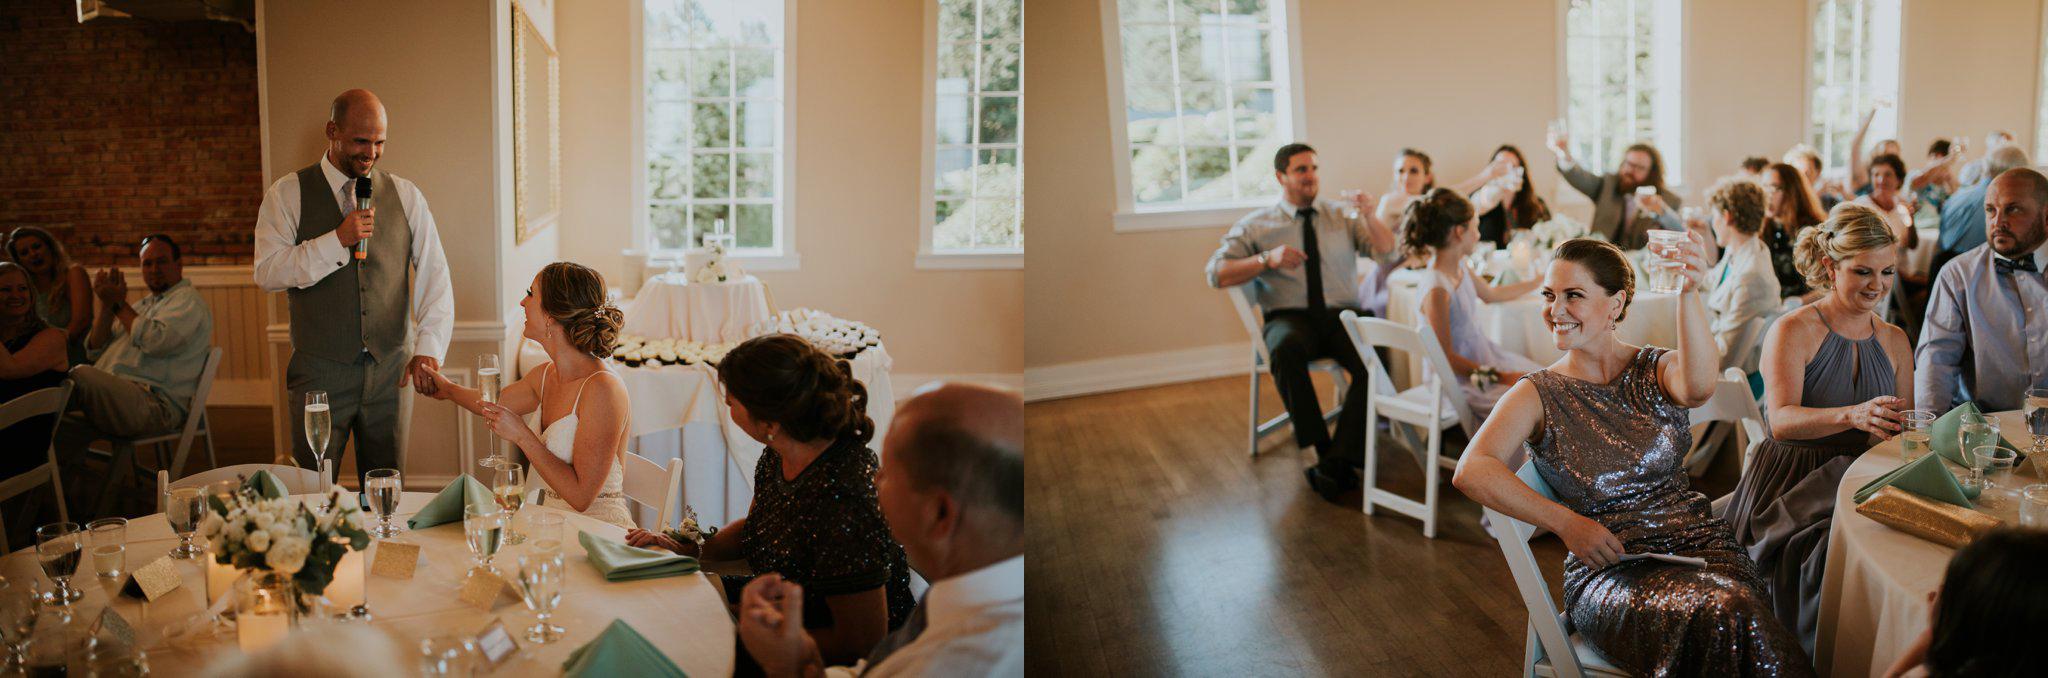 hollywood-school-house-wedding-seattle-photographer-caitlyn-nikula-99.jpg